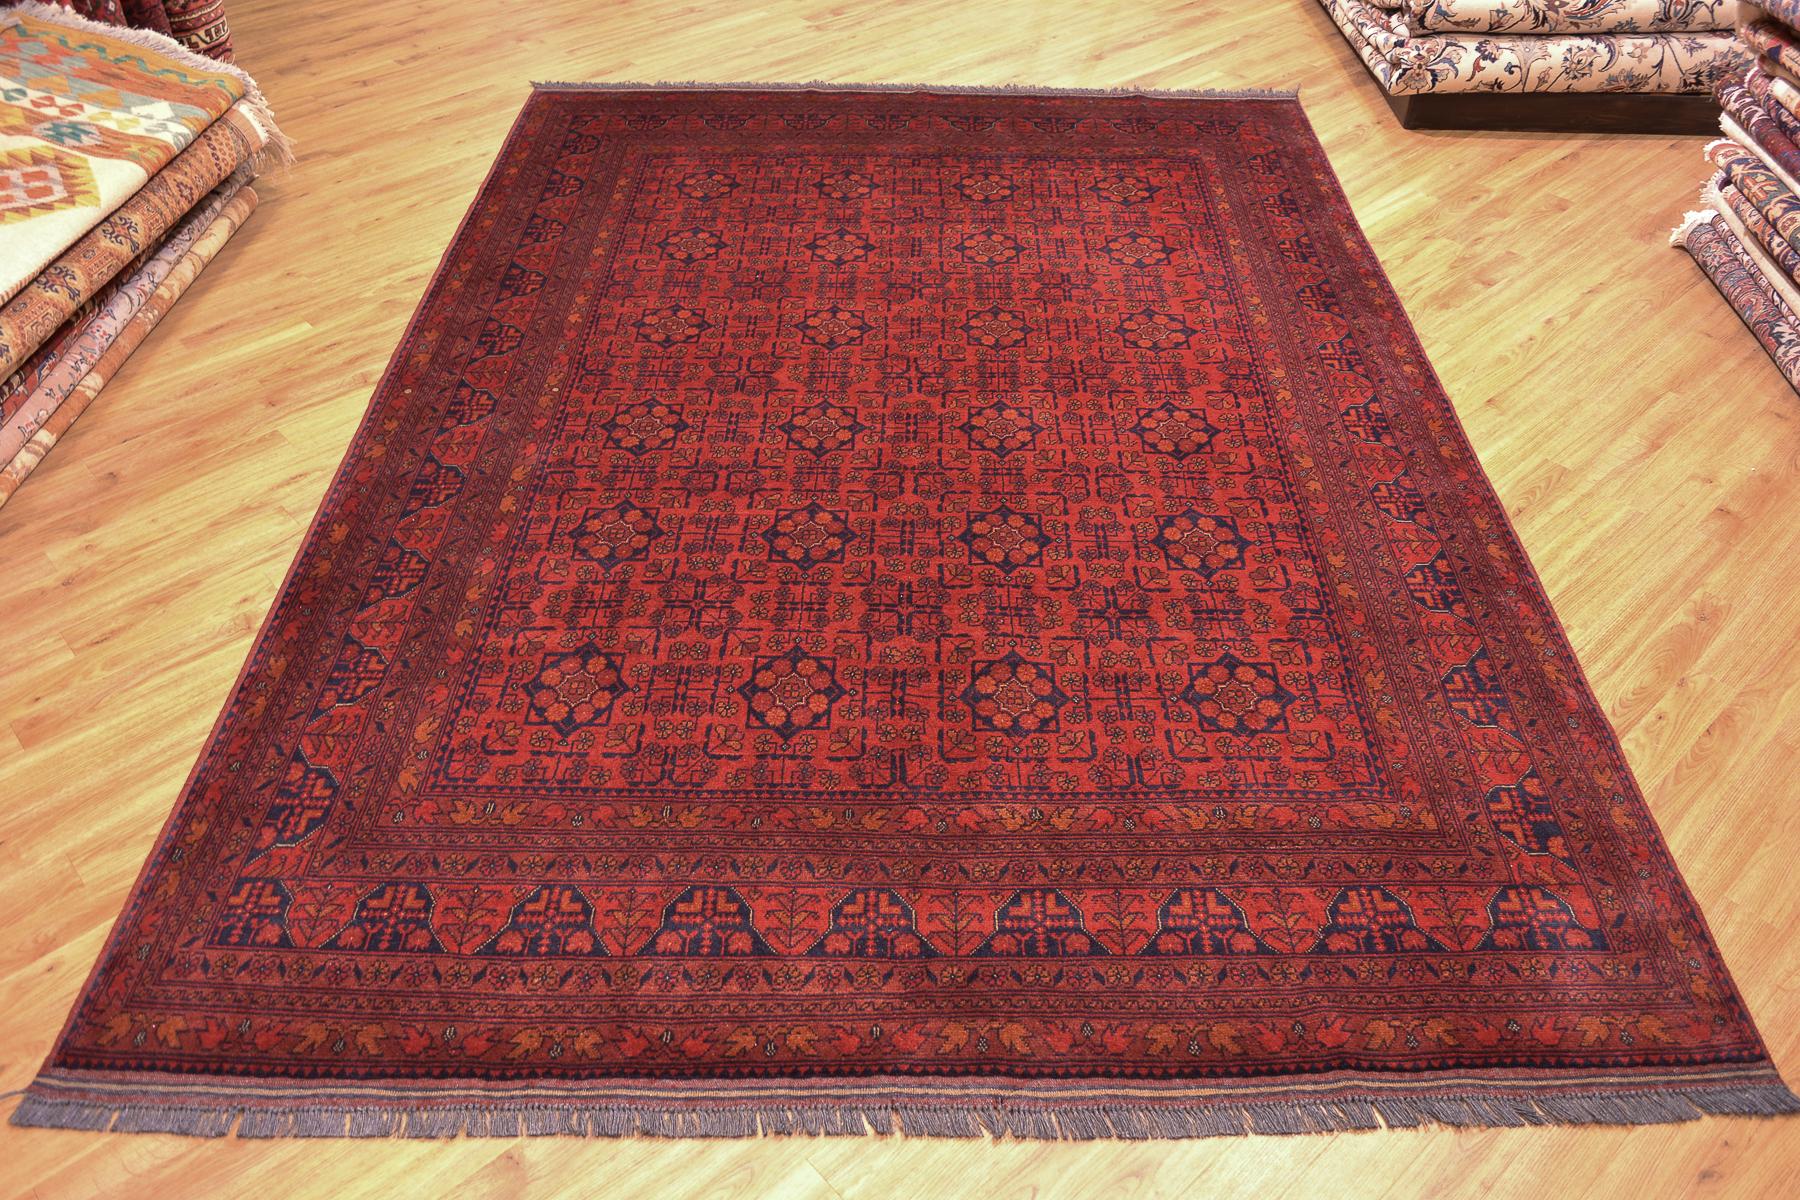 Afghan Khan Mohamadi Carpet 2 88x2 06m The Oriental Rug